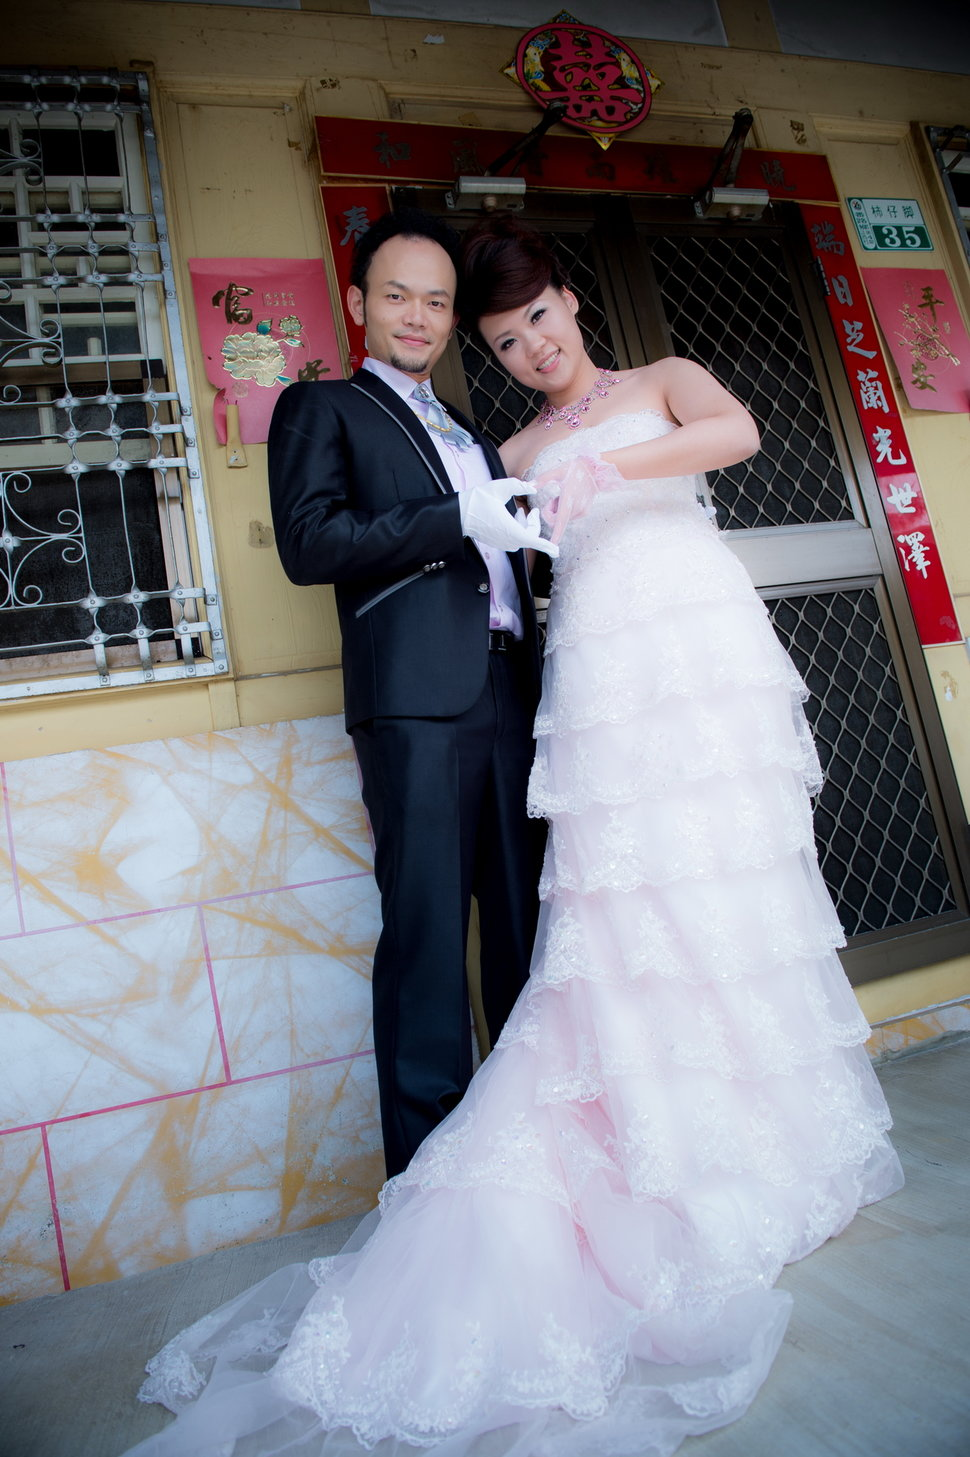 DSC_3499 - 婚攝溏威自助婚紗婚禮紀錄新秘孕寫真全家福《結婚吧》